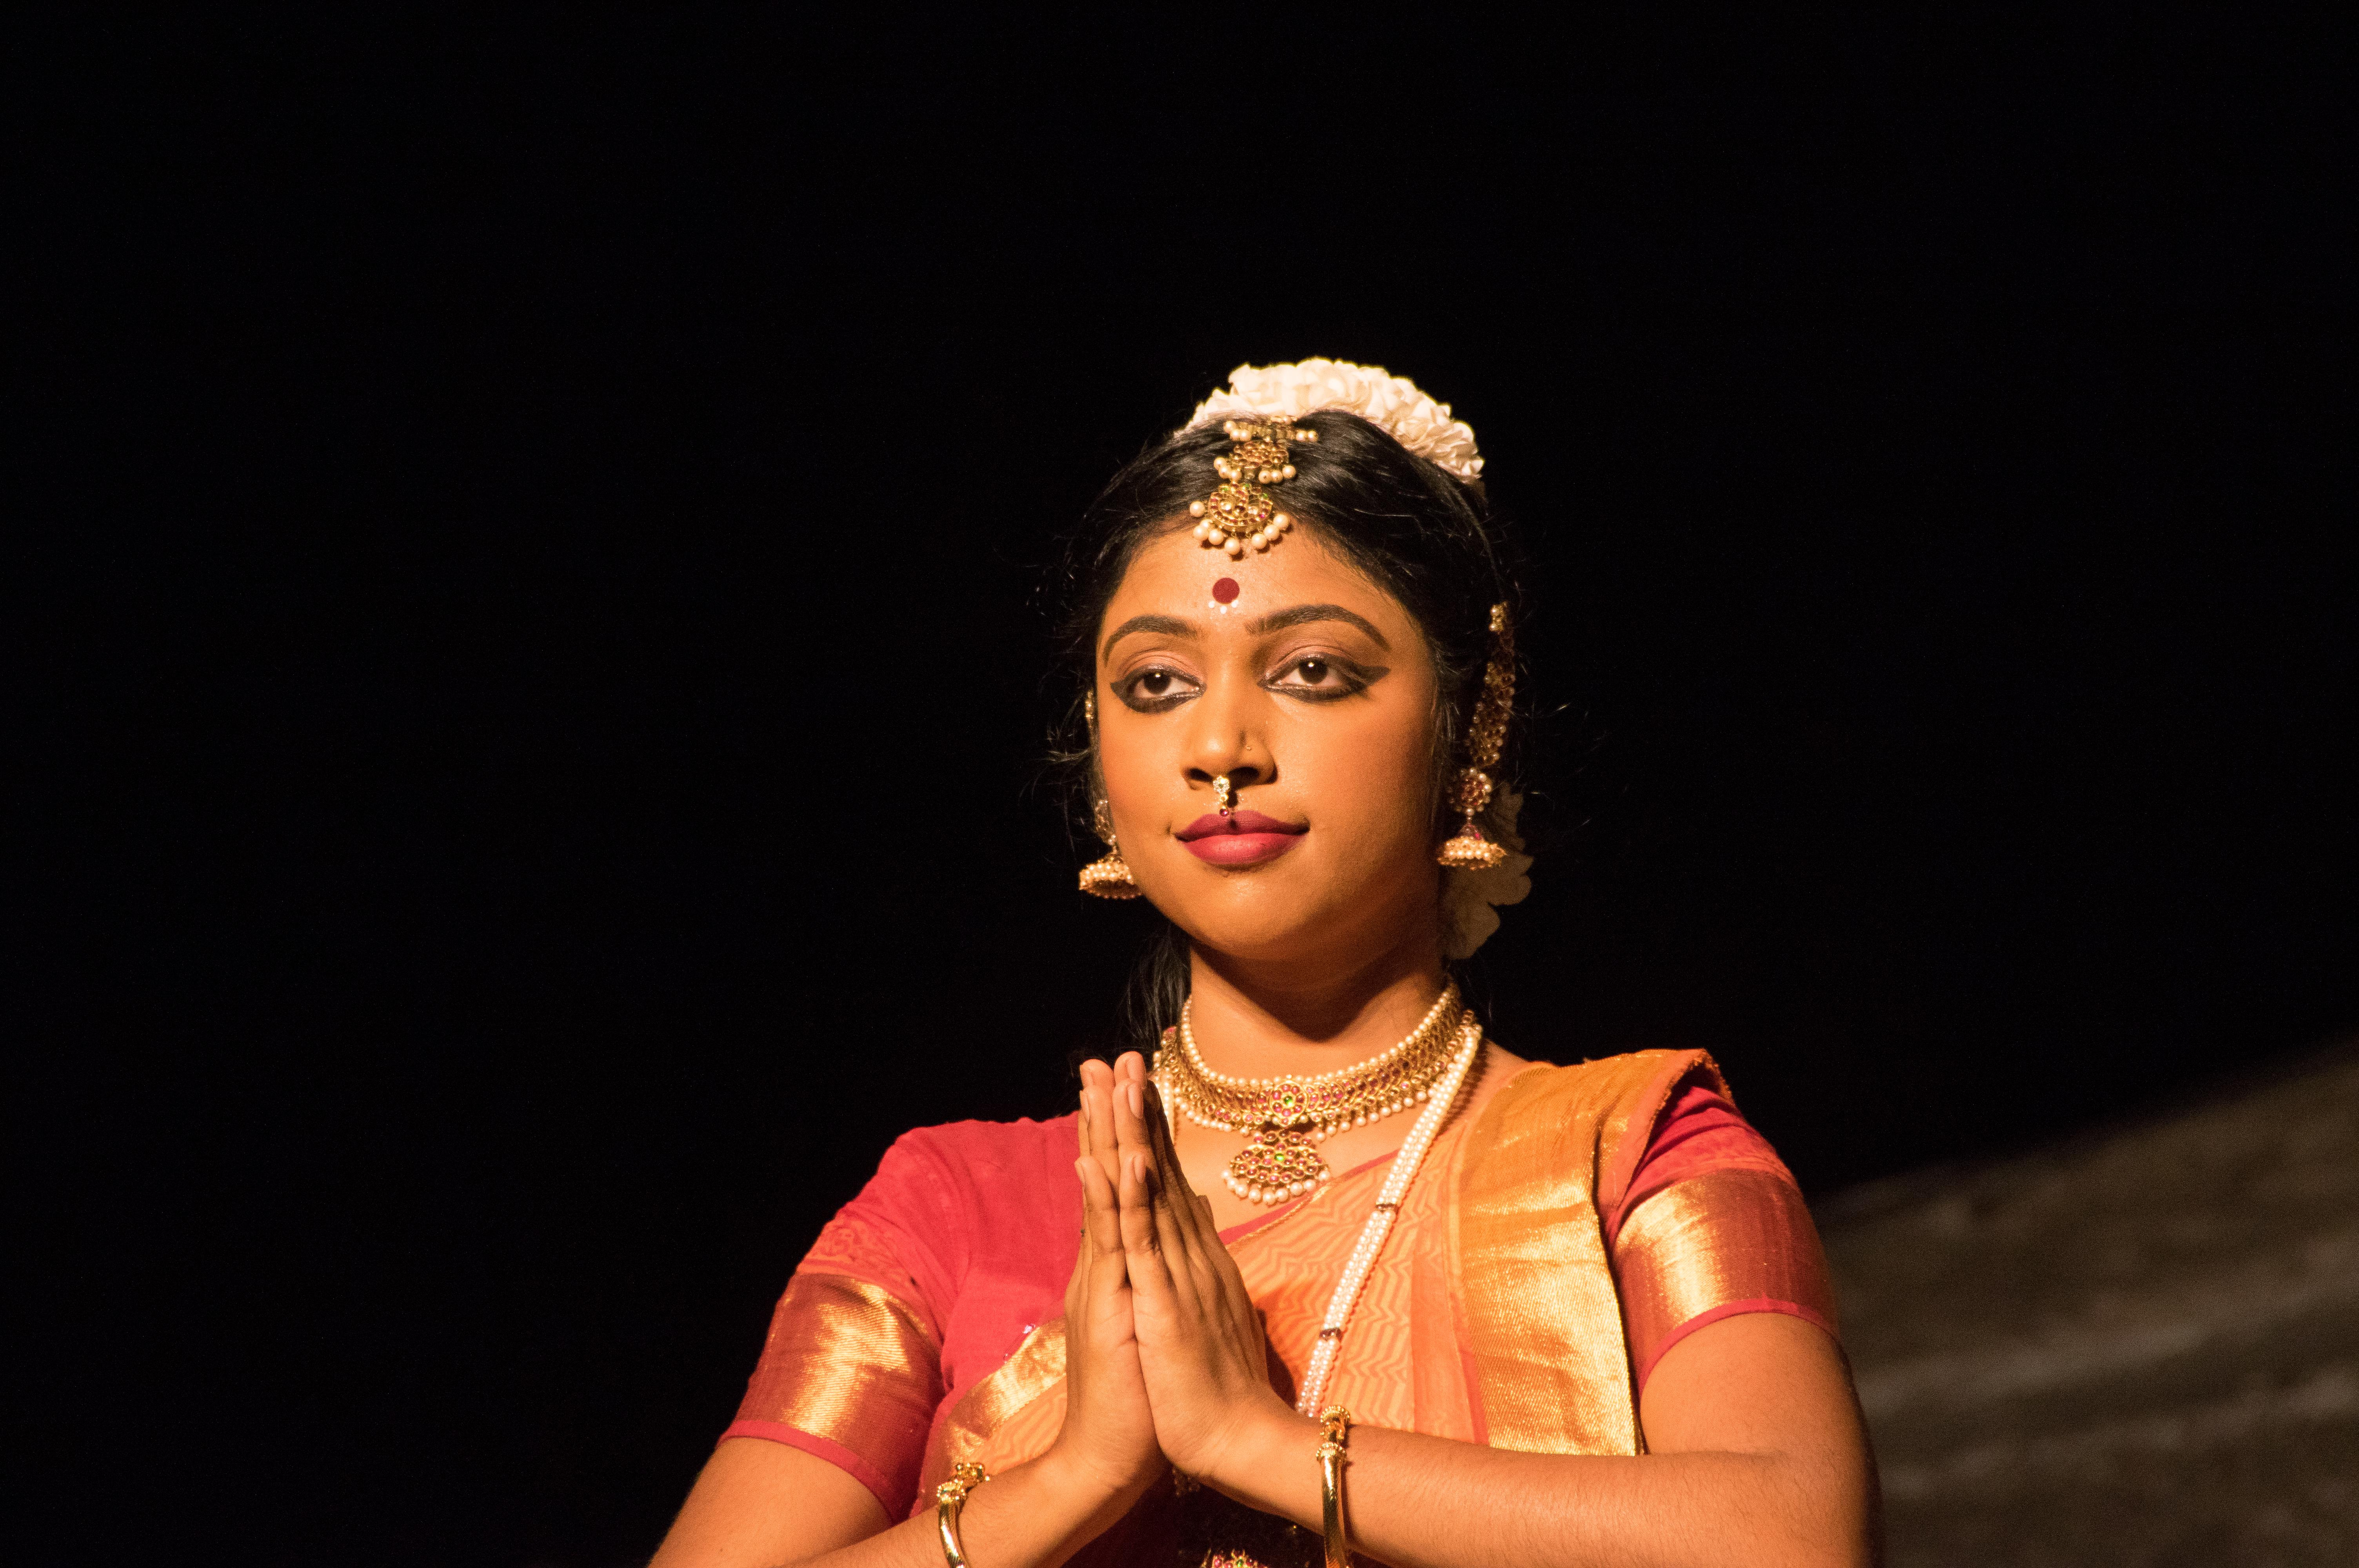 Celebrate Diwali with us